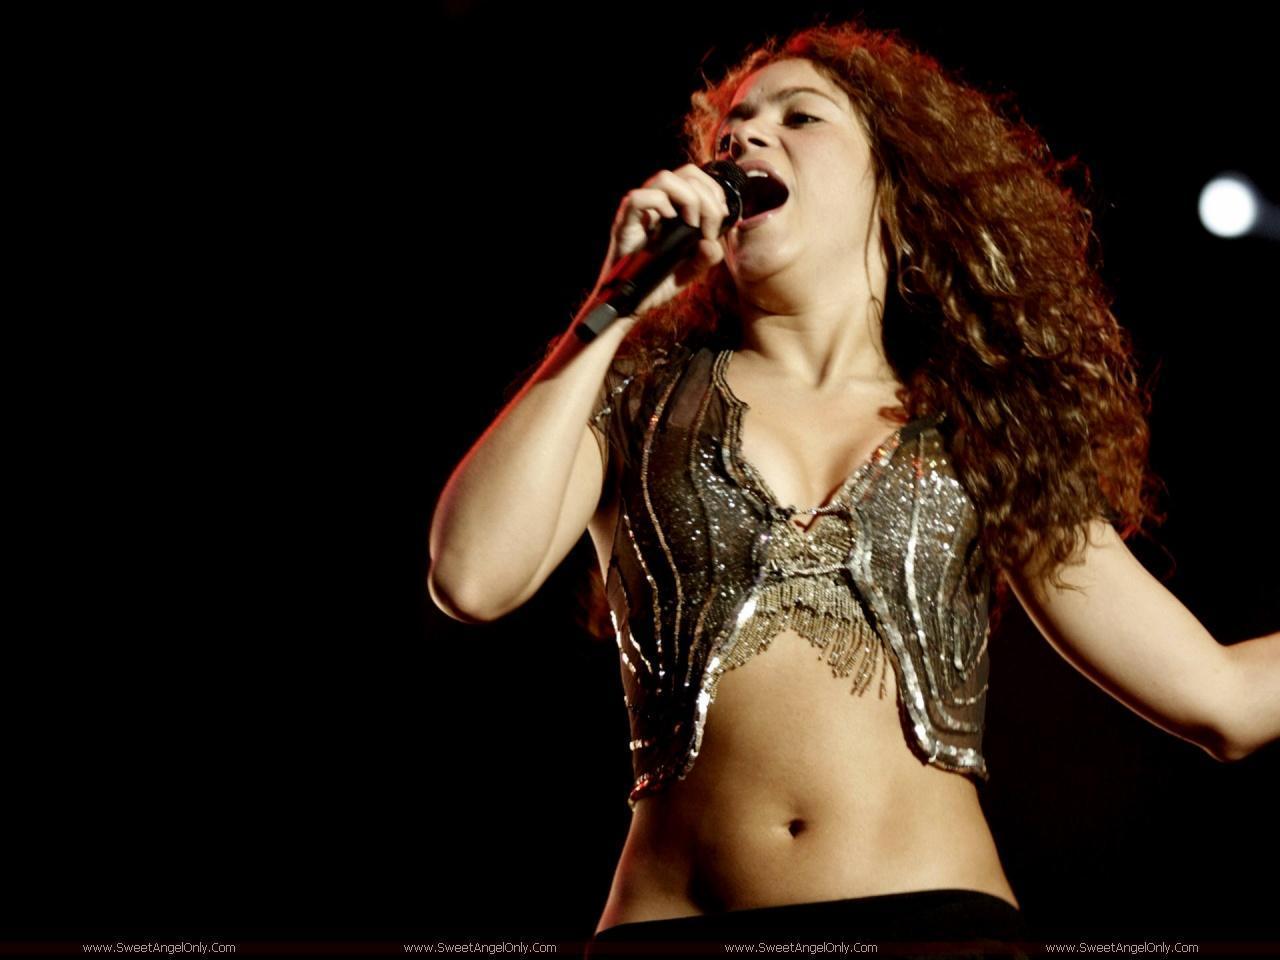 http://2.bp.blogspot.com/-rpgH-Kn7_24/Tird2TL0eSI/AAAAAAAAHqw/LC9gvo-VWo0/s1600/Shakira_performing.jpg